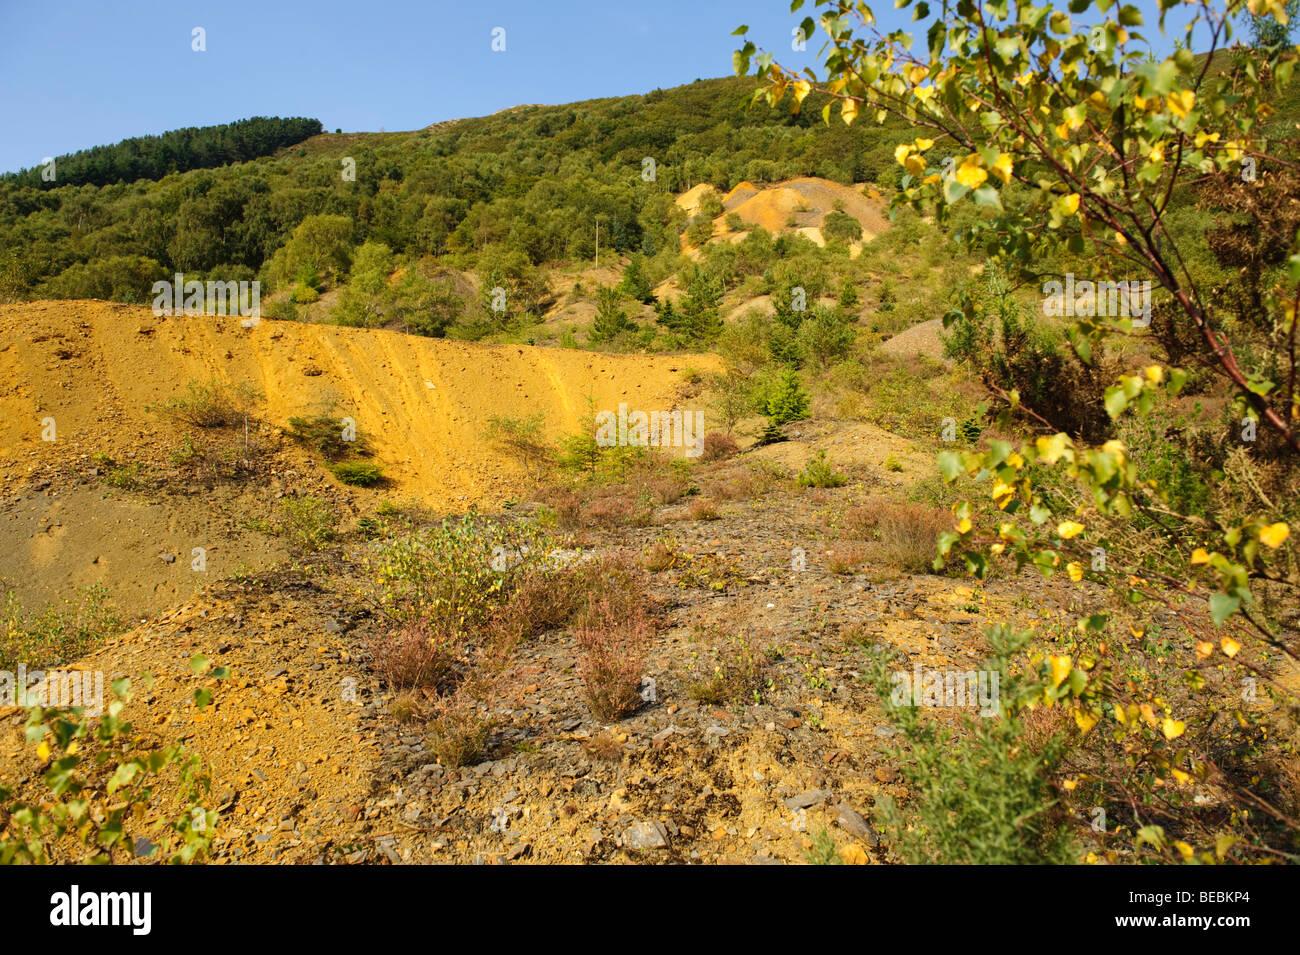 Gelbe ocker farbigen Giftmüll verderben aus alten Zink Bleiminen zurückgefordert wird langsam durch Pflanzen Stockbild